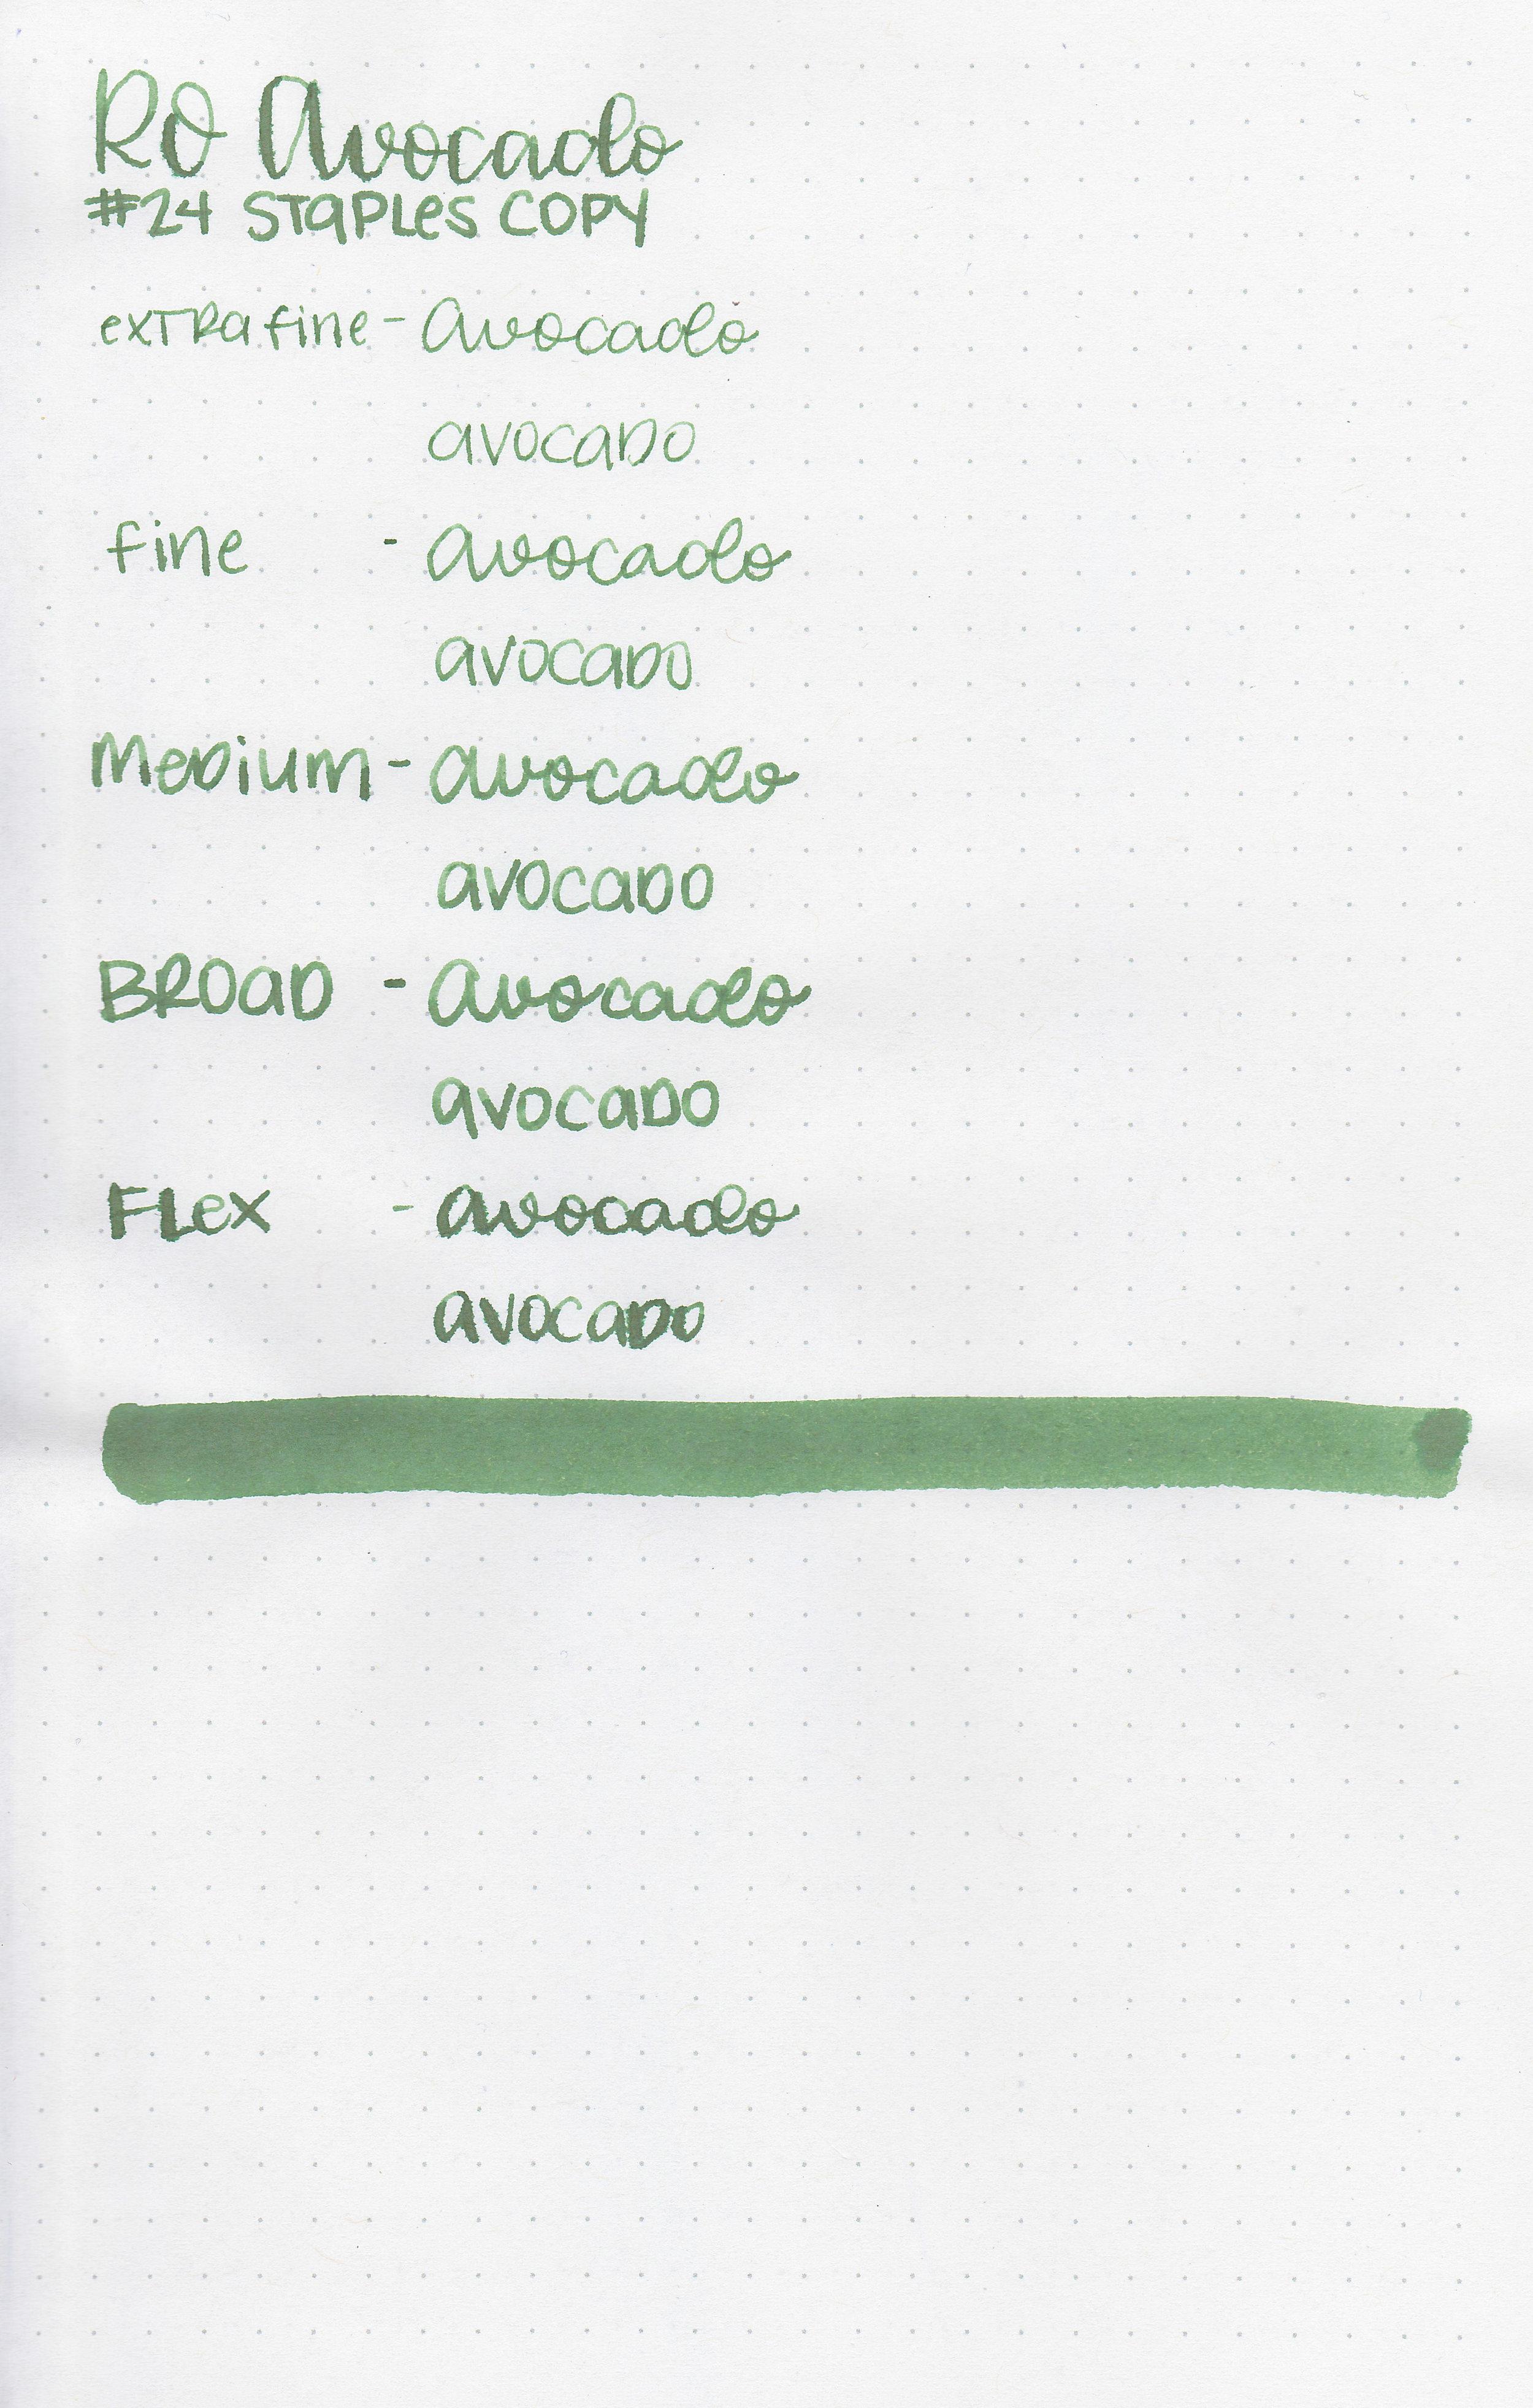 ro-avocado-11.jpg